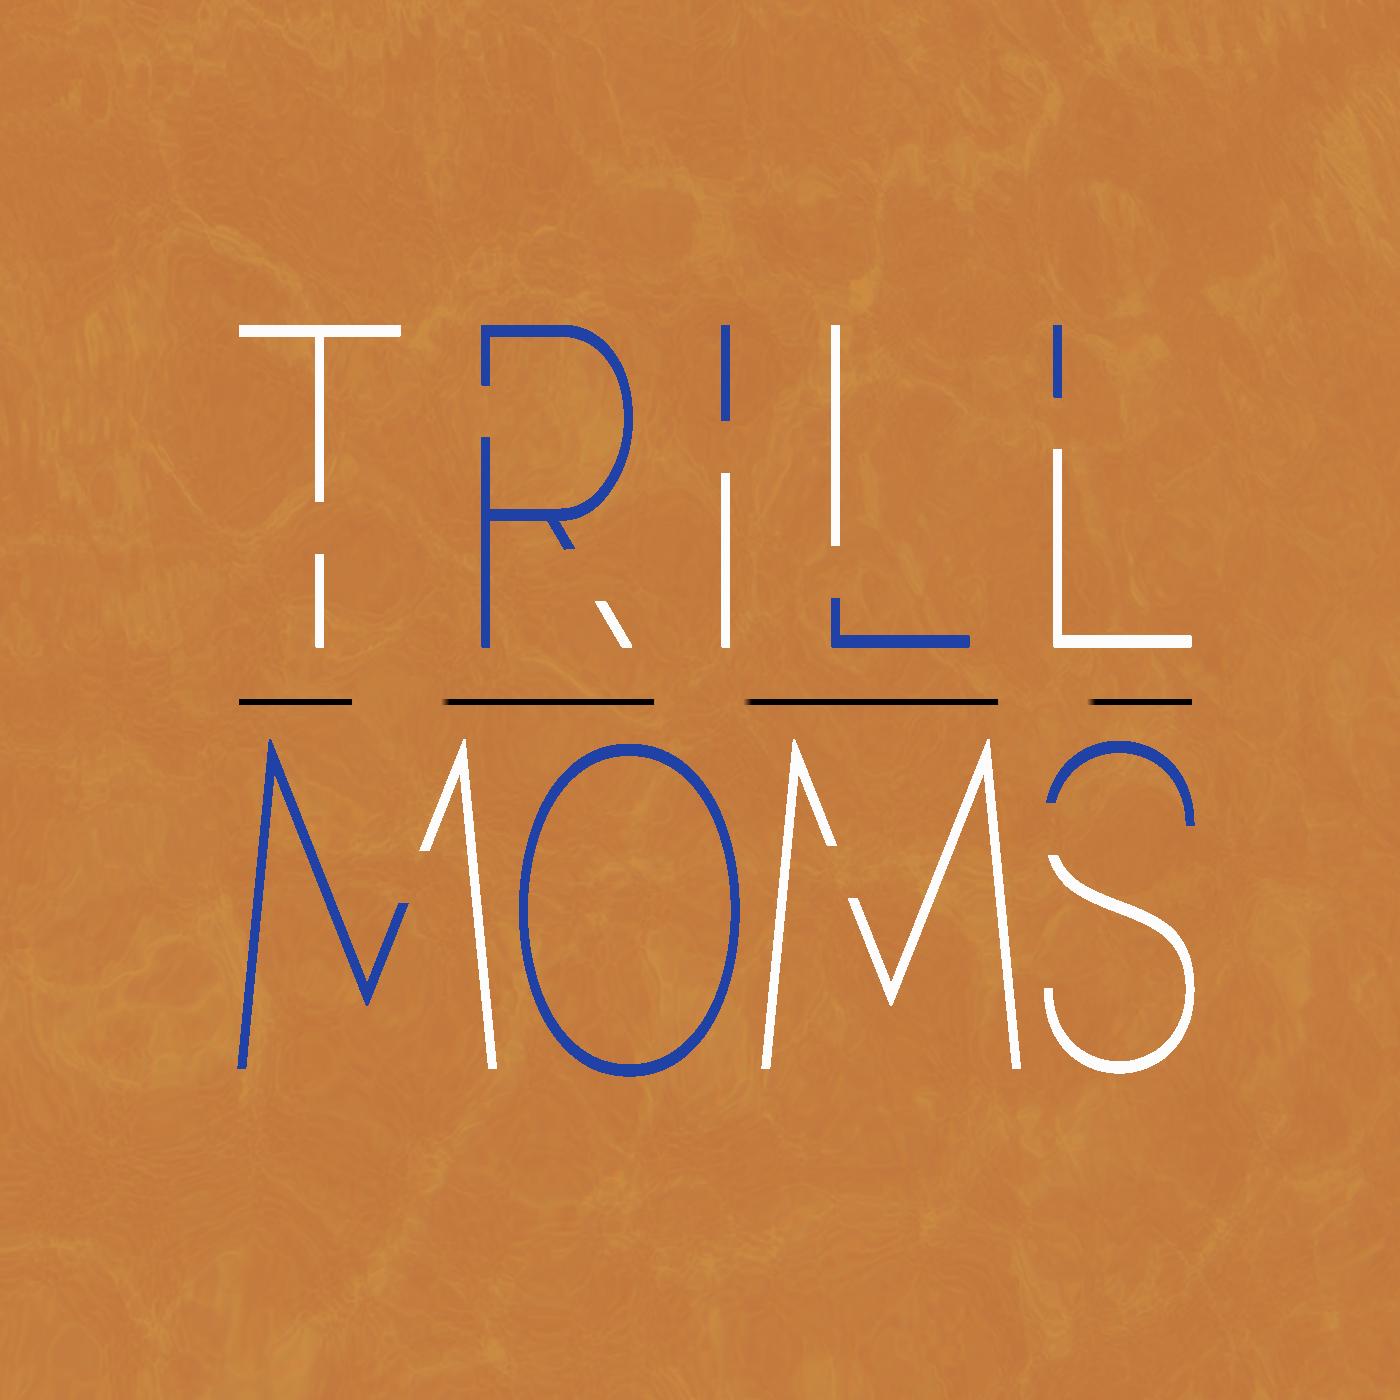 Trill Moms's Podcast show art